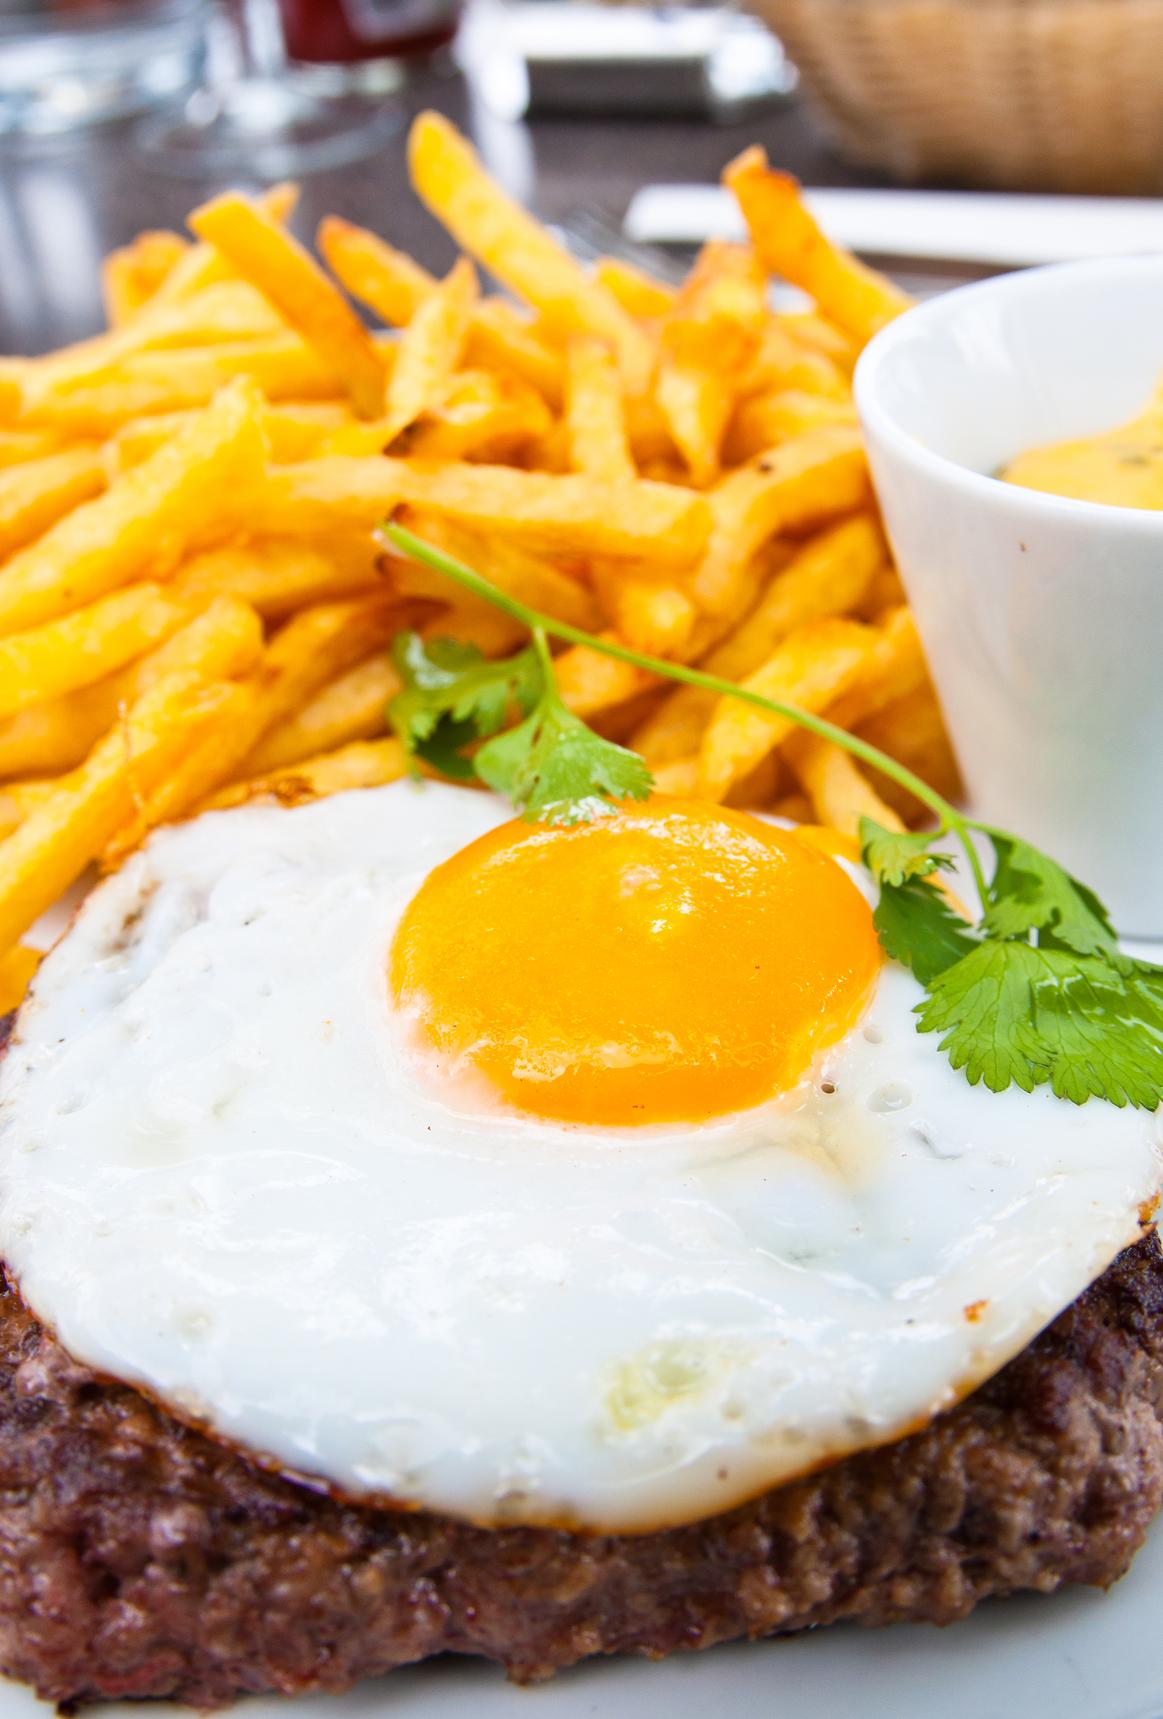 Milanesa con patatas fritas